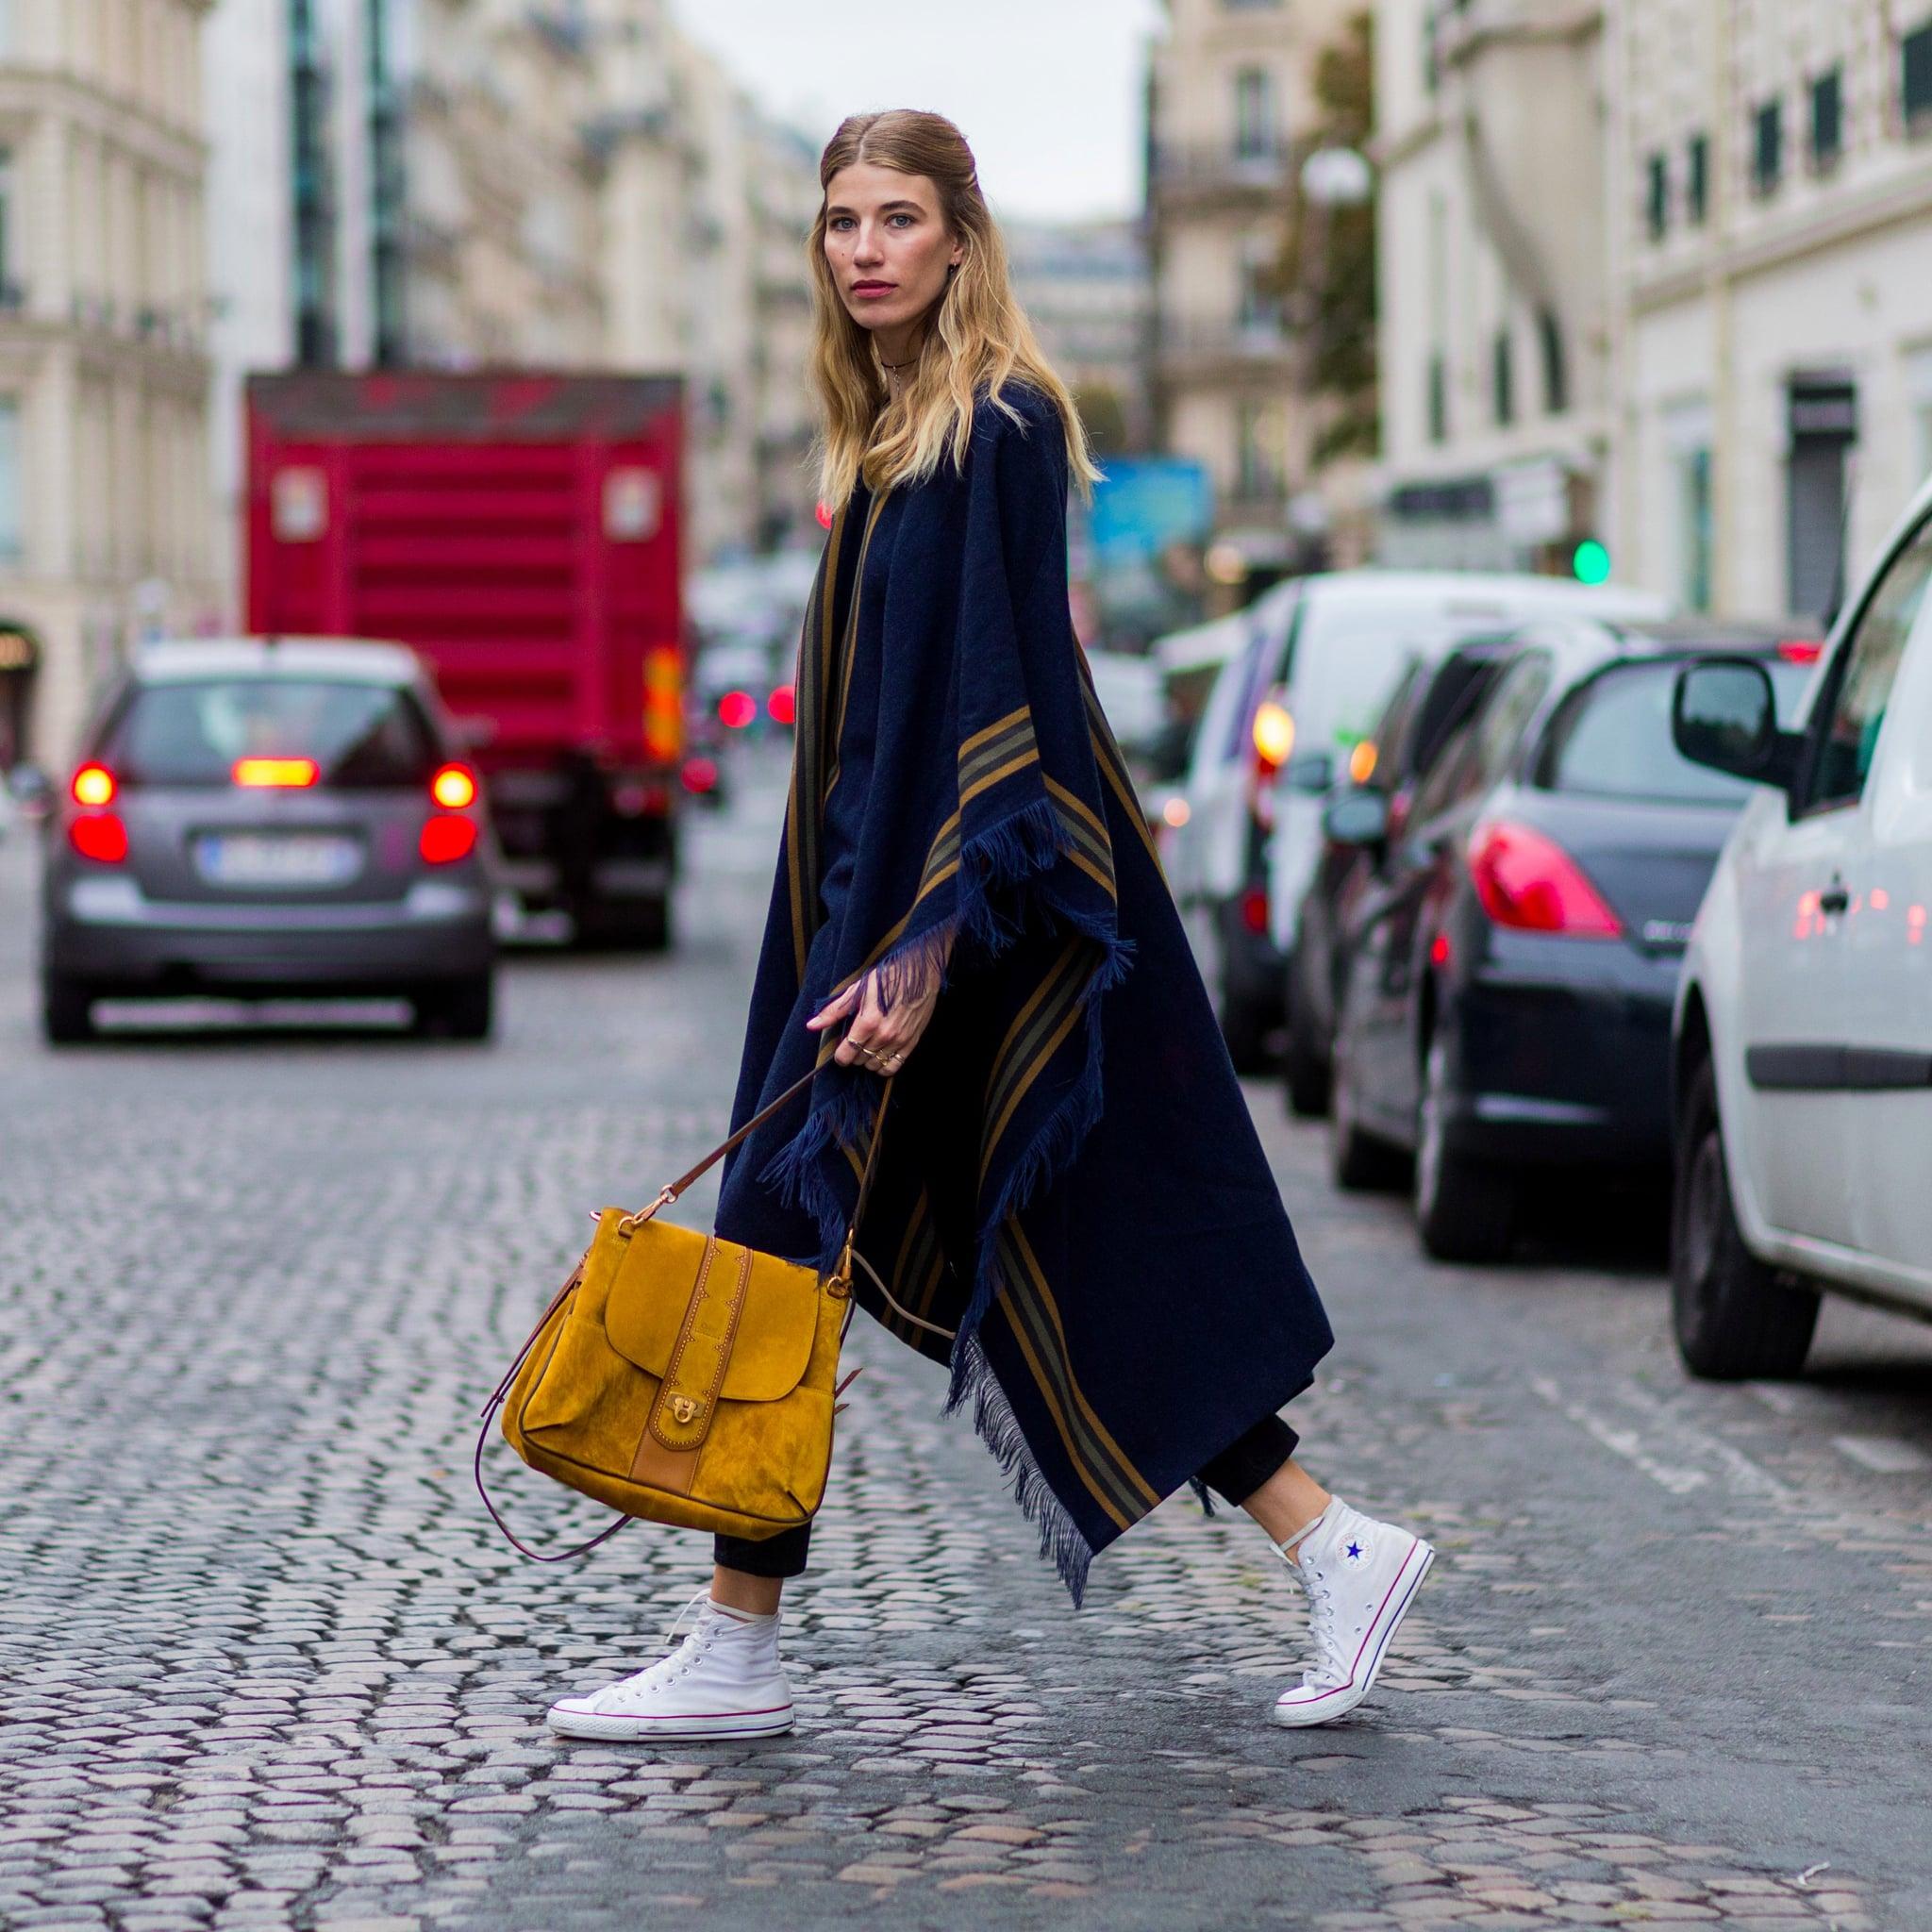 How to Wear High Tops | POPSUGAR Fashion